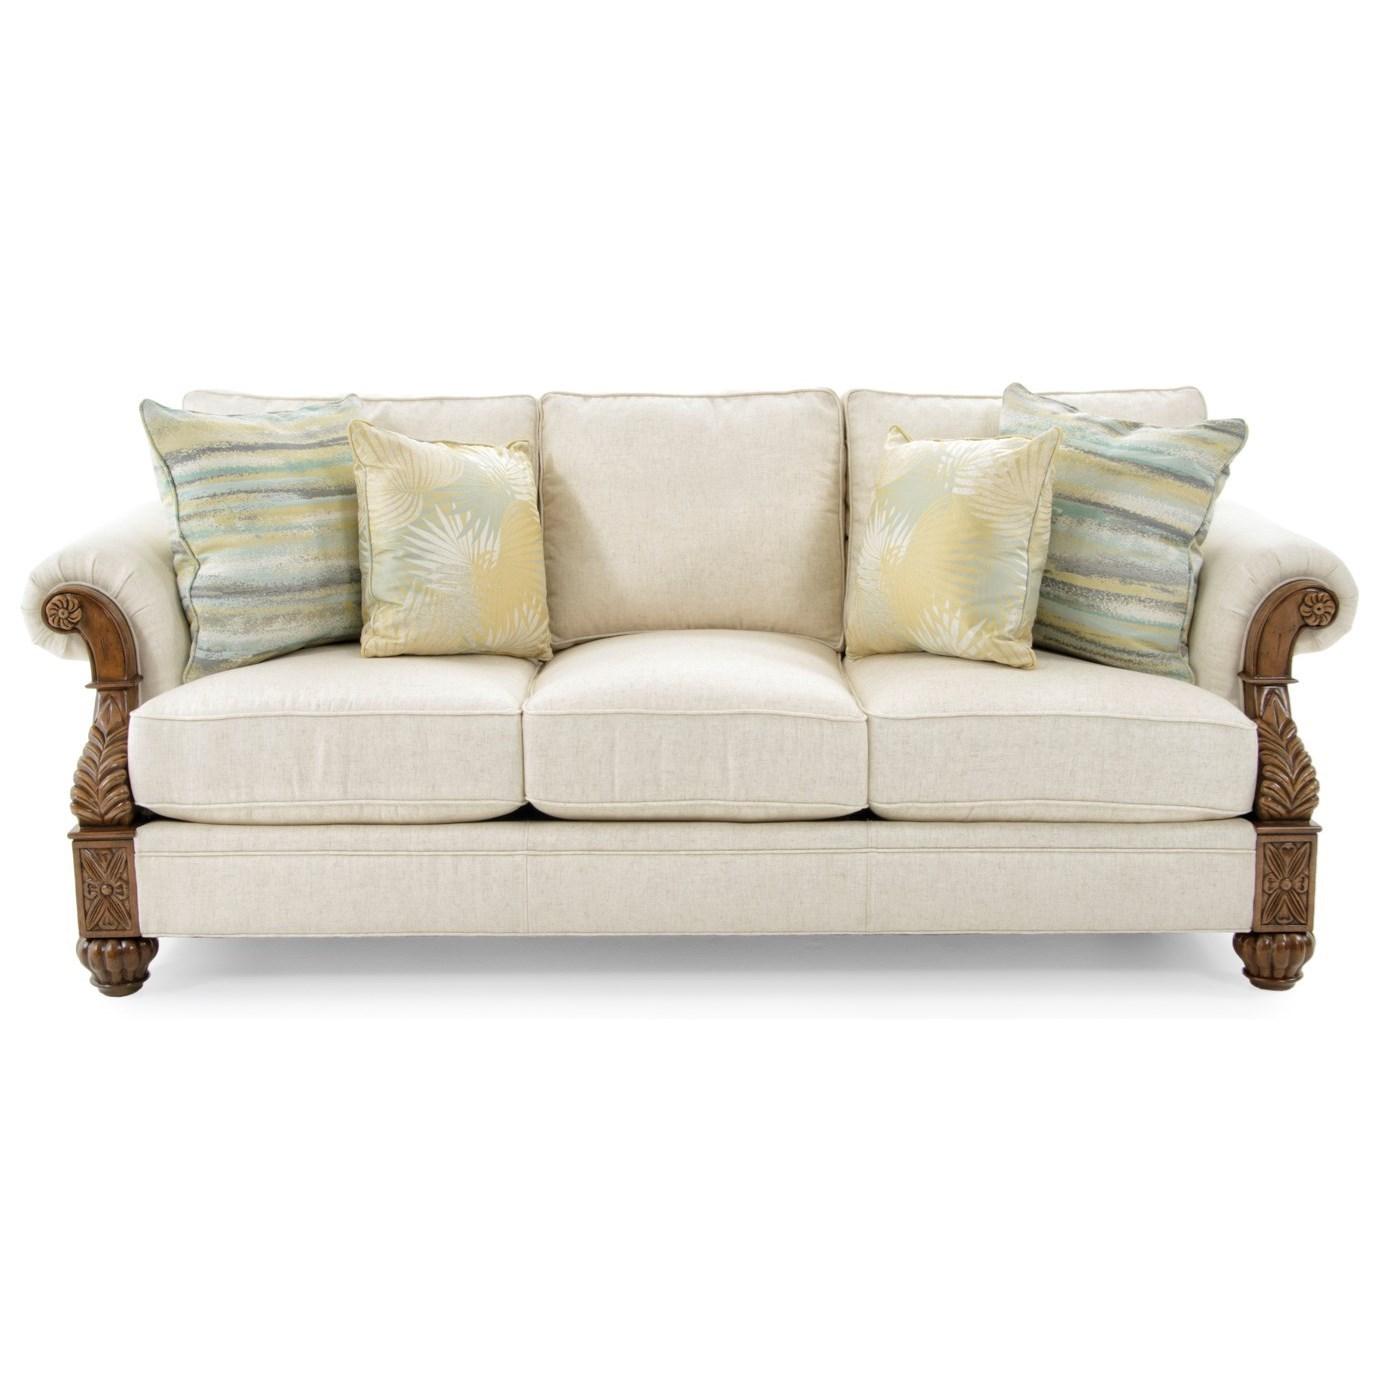 Lexington Quick Ship Upholstery Quick Ship Benoa Harbour Sofa - Item Number: 7530-33-02